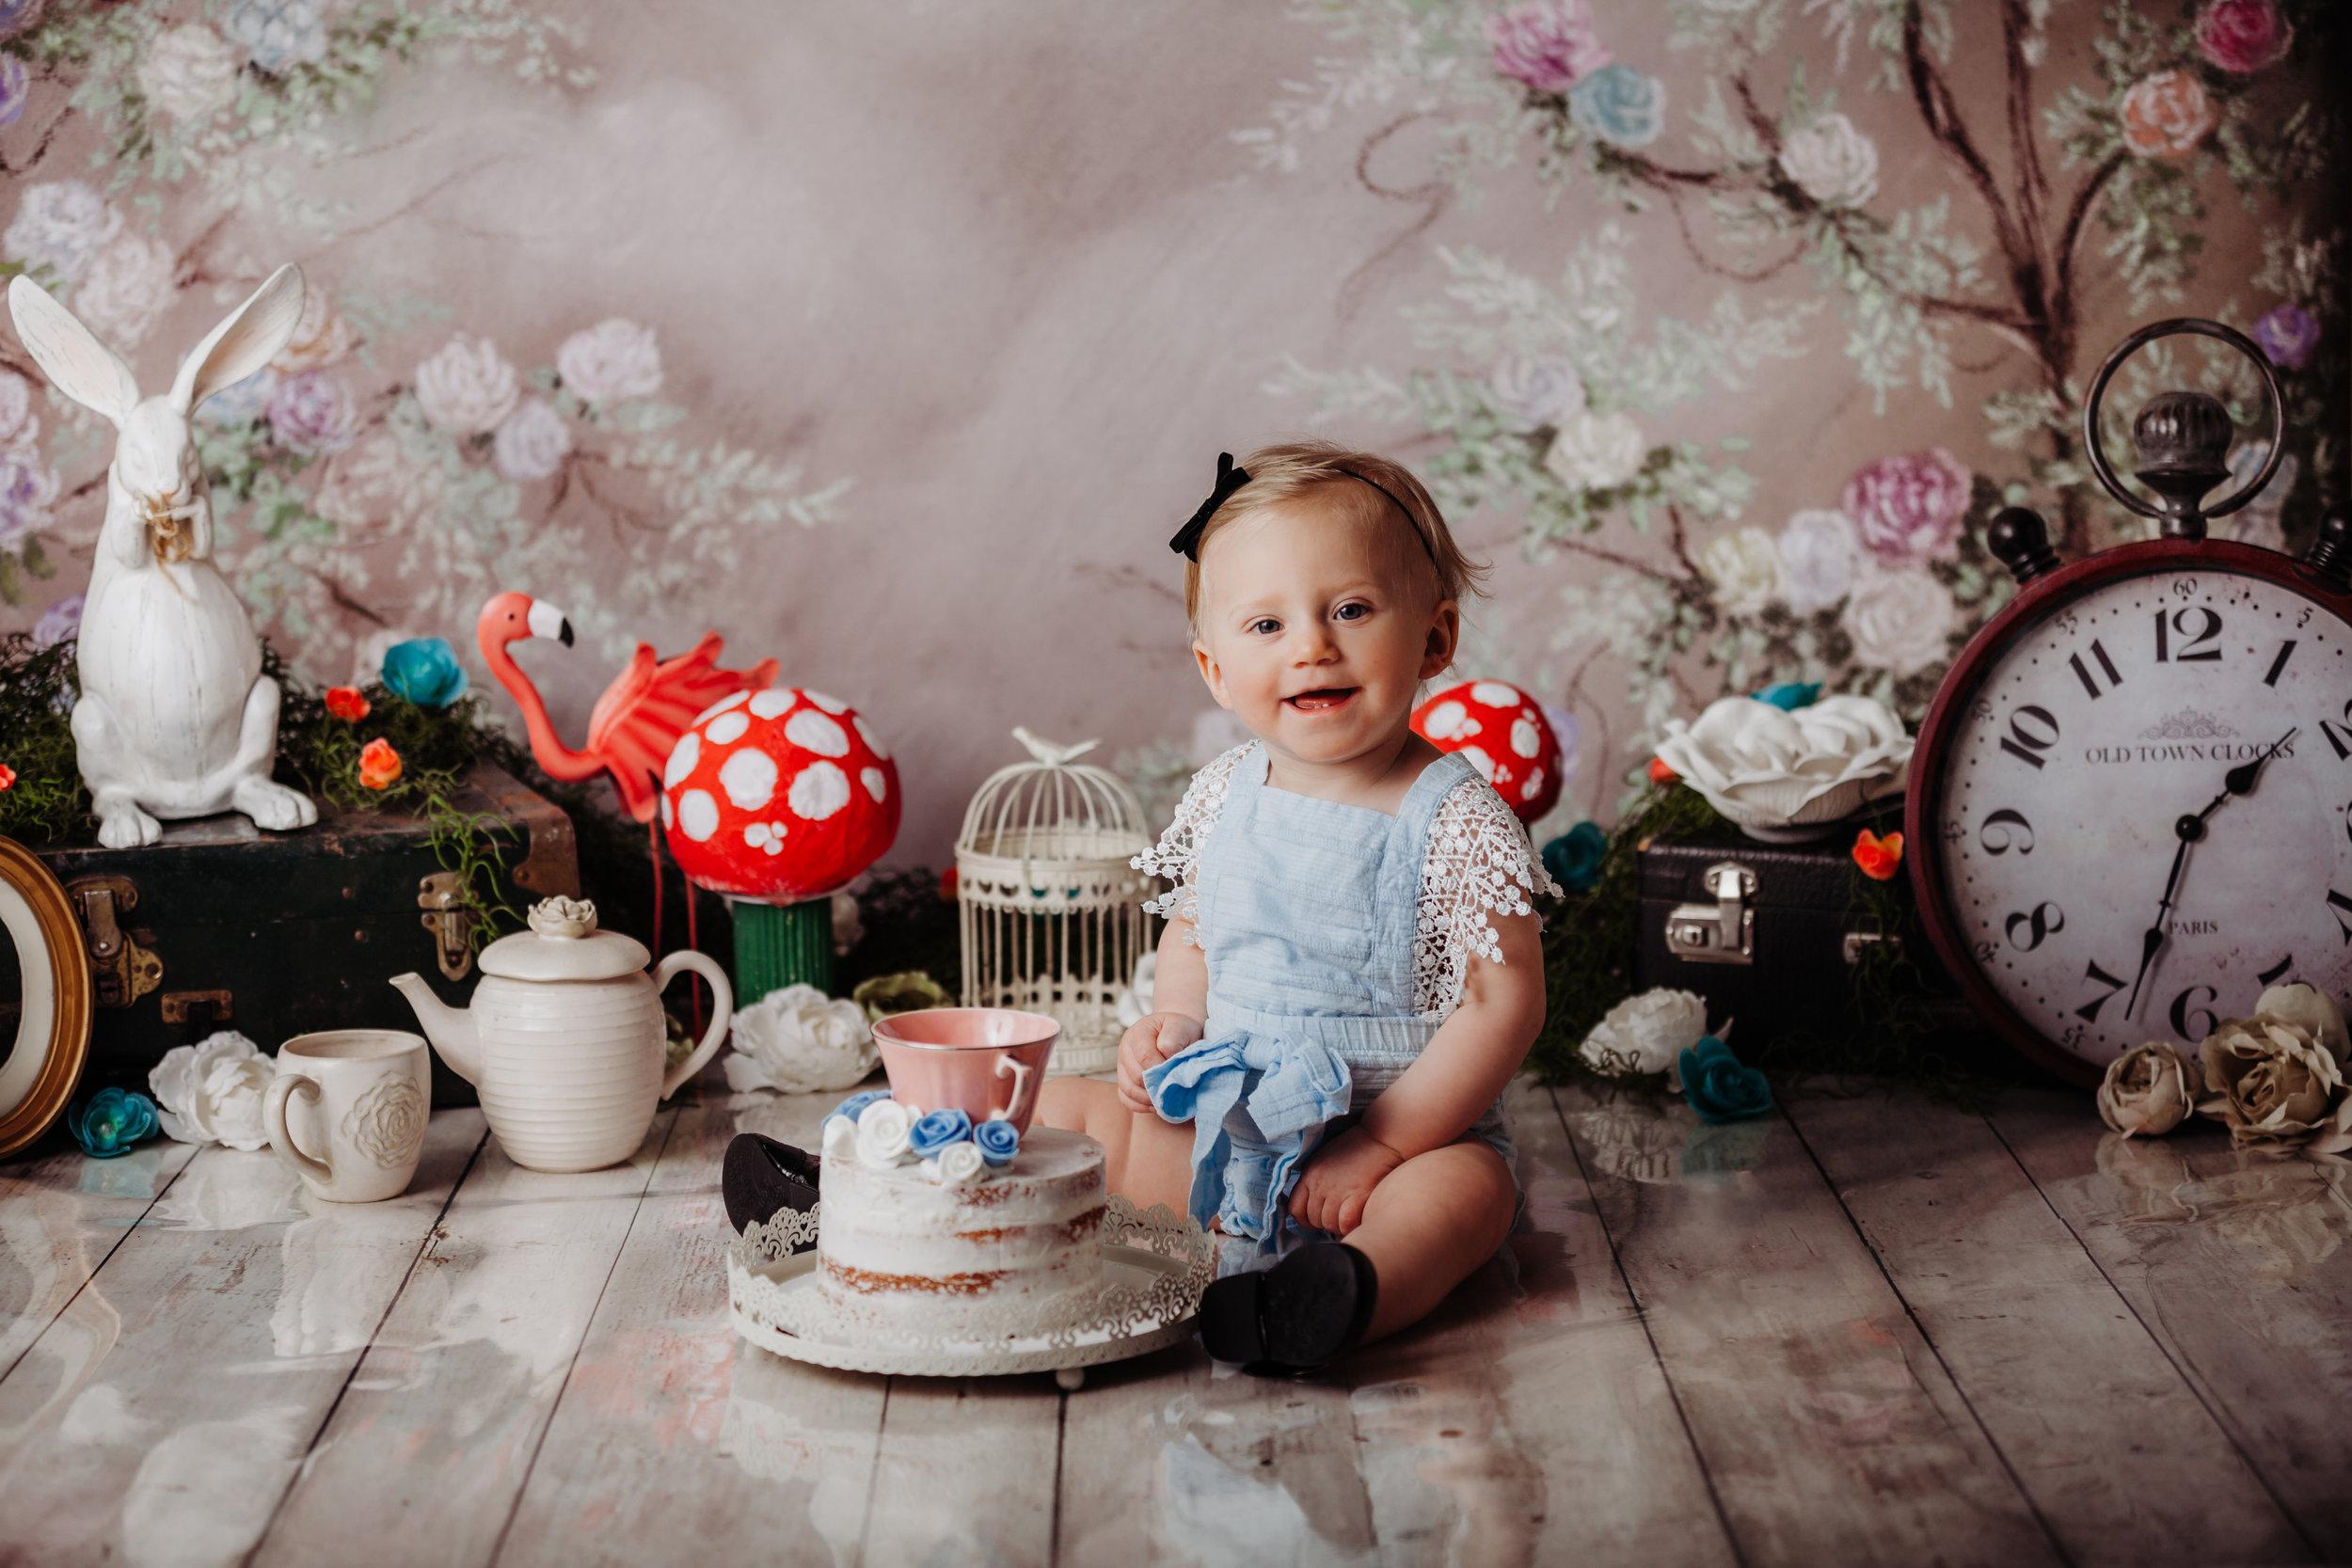 Cake Smash Photo Session Cheyenne WY 03 AM Photography LLC.JPG